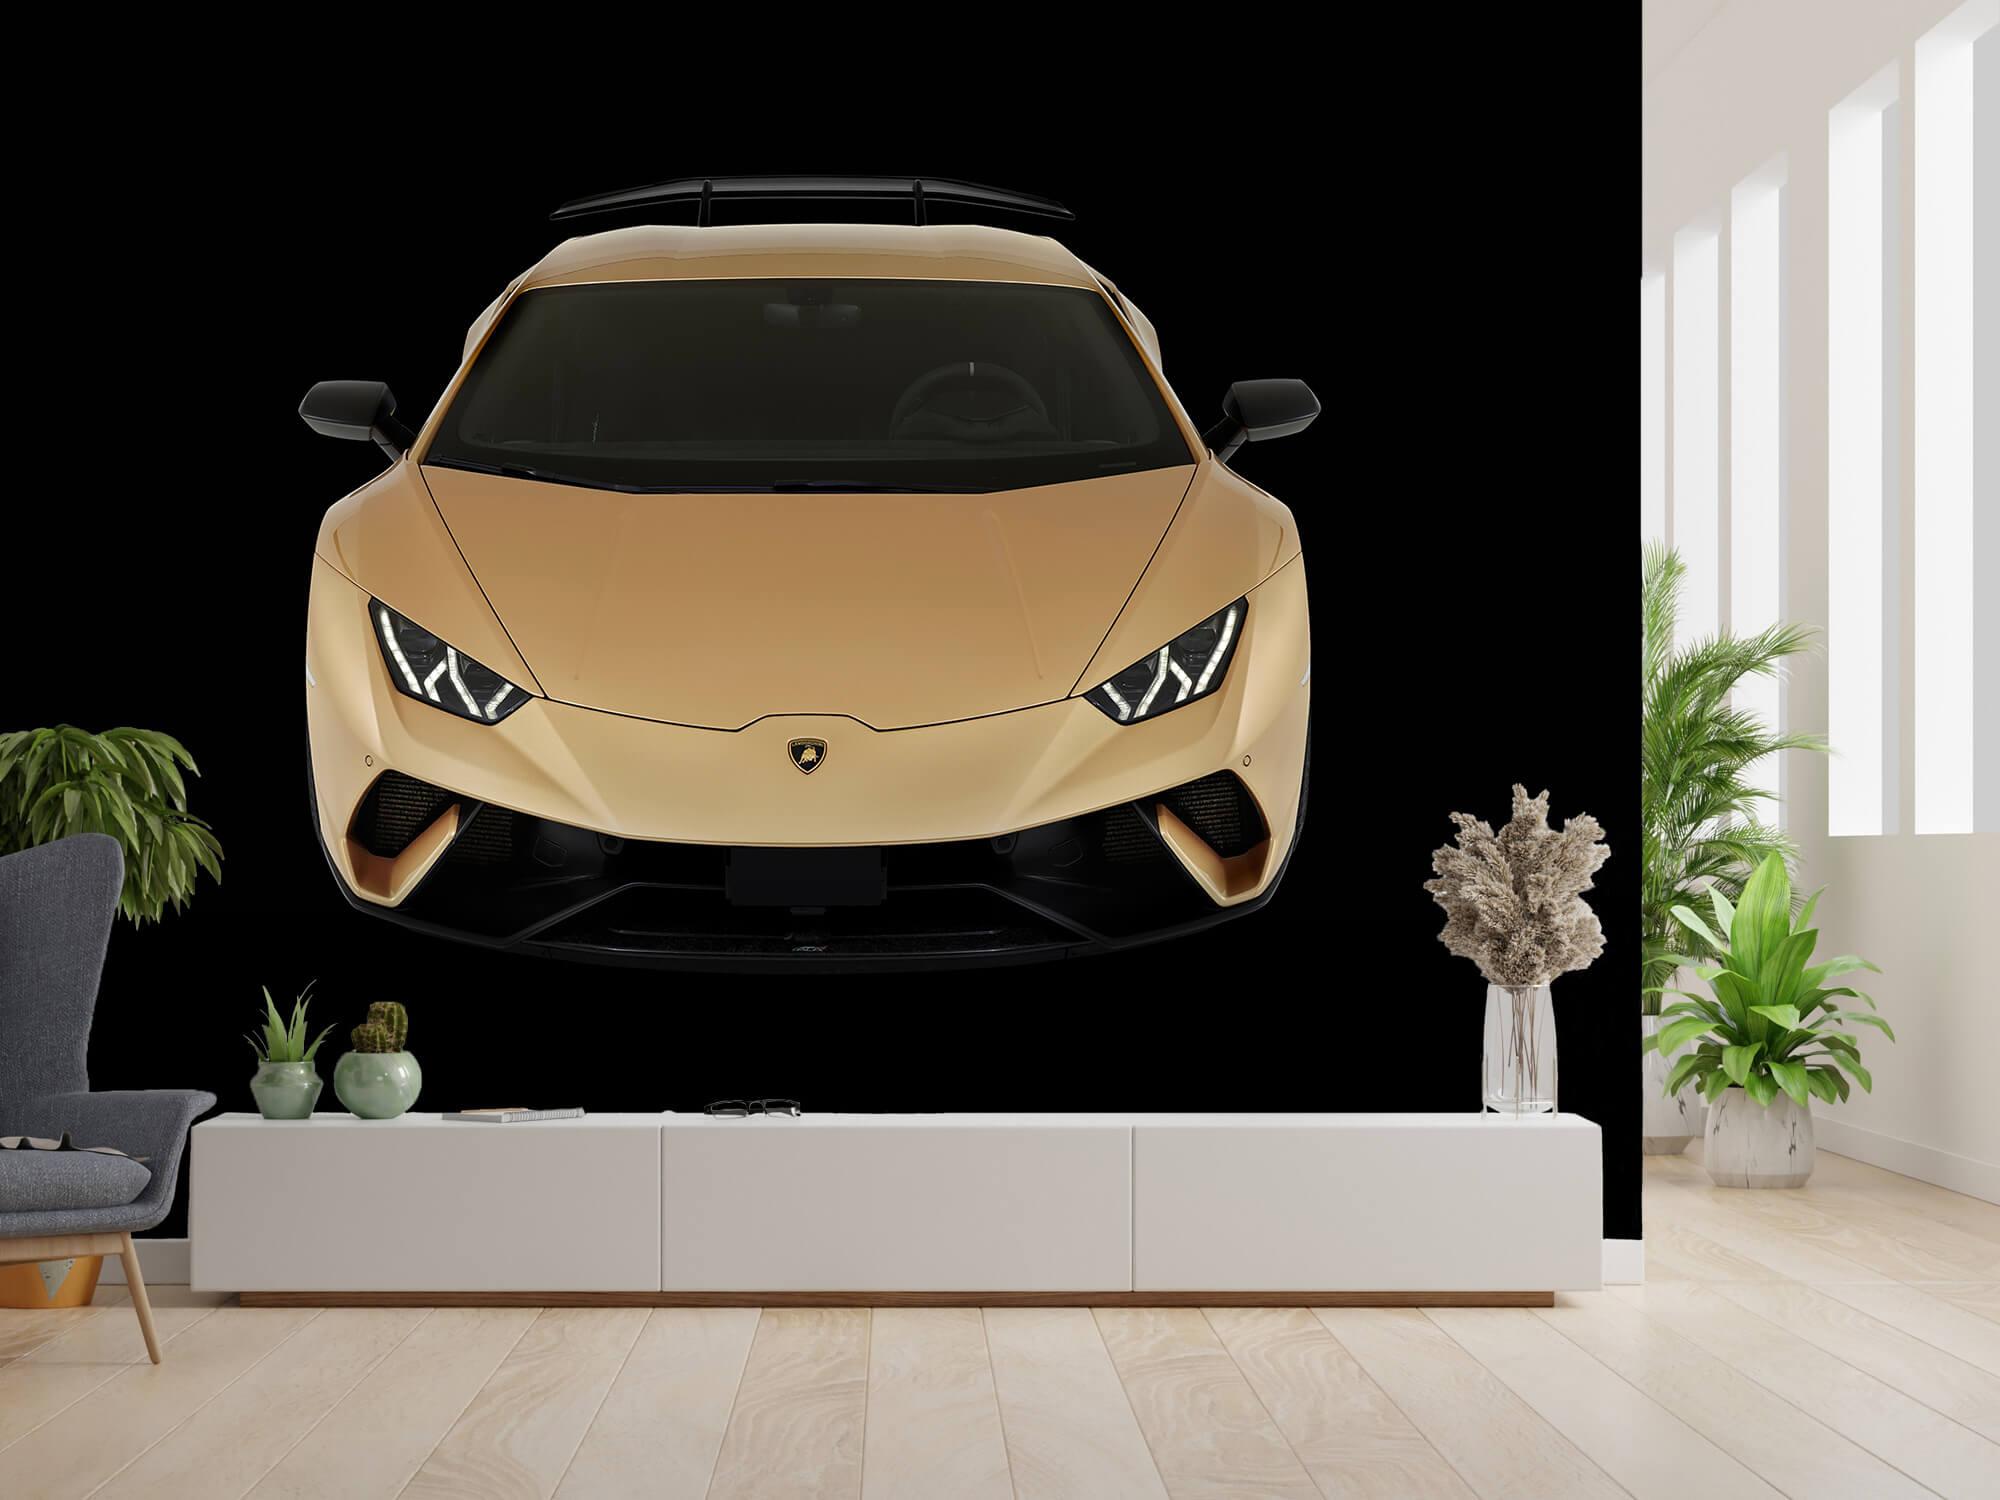 Wallpaper Lamborghini Huracán - Avant du dessus, noir 14